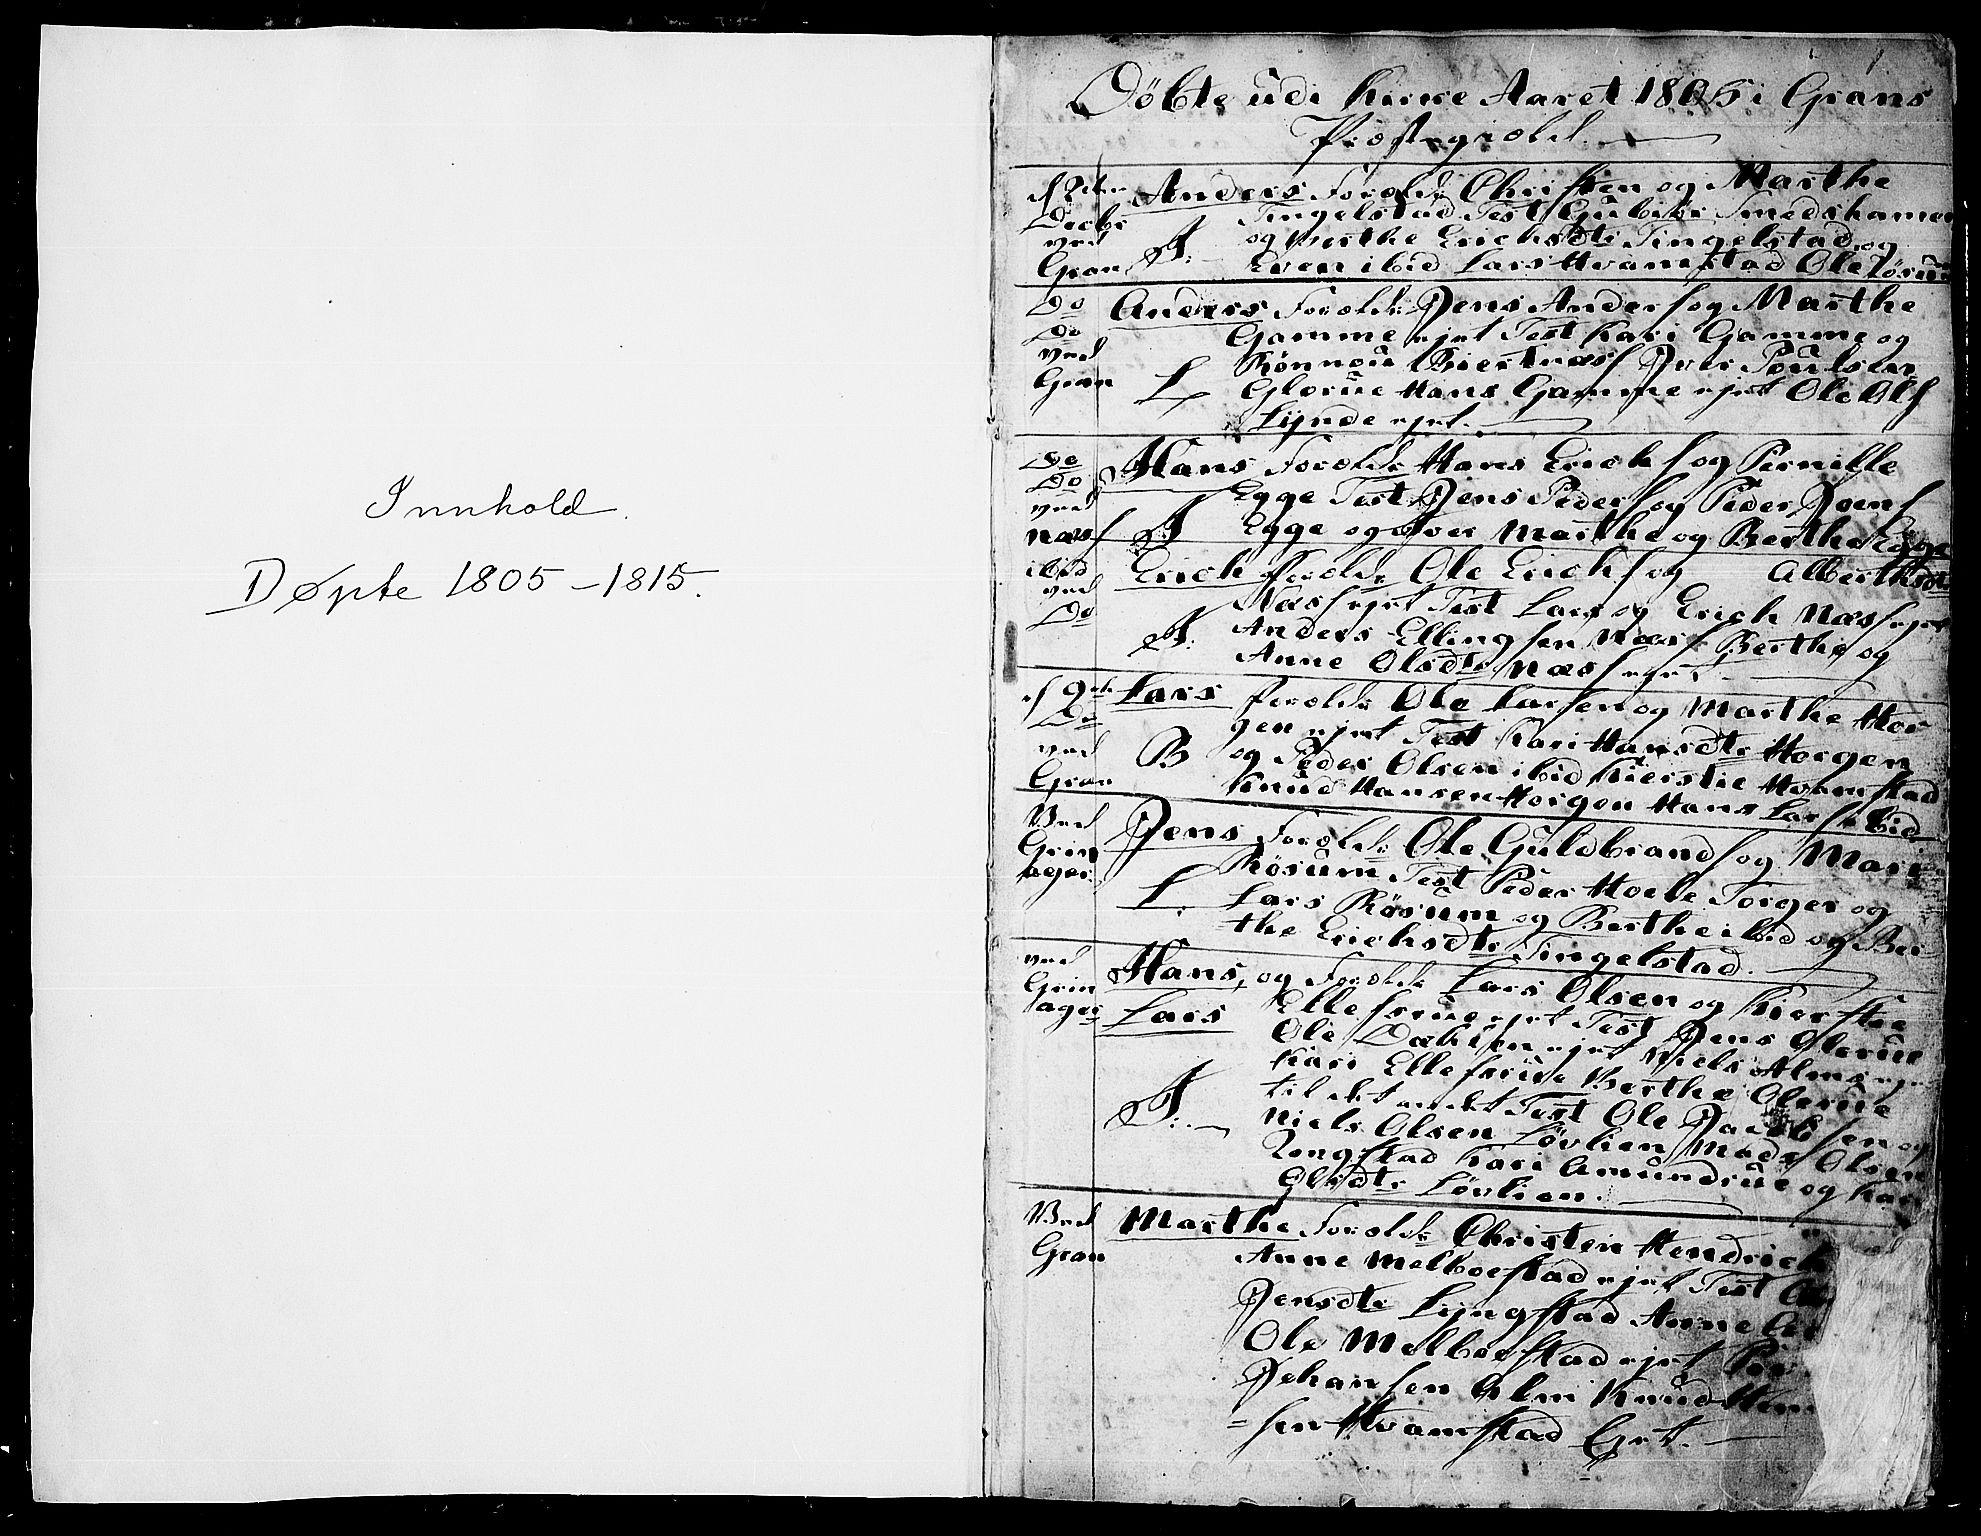 SAH, Gran prestekontor, Ministerialbok nr. 7, 1804-1815, s. 0-1